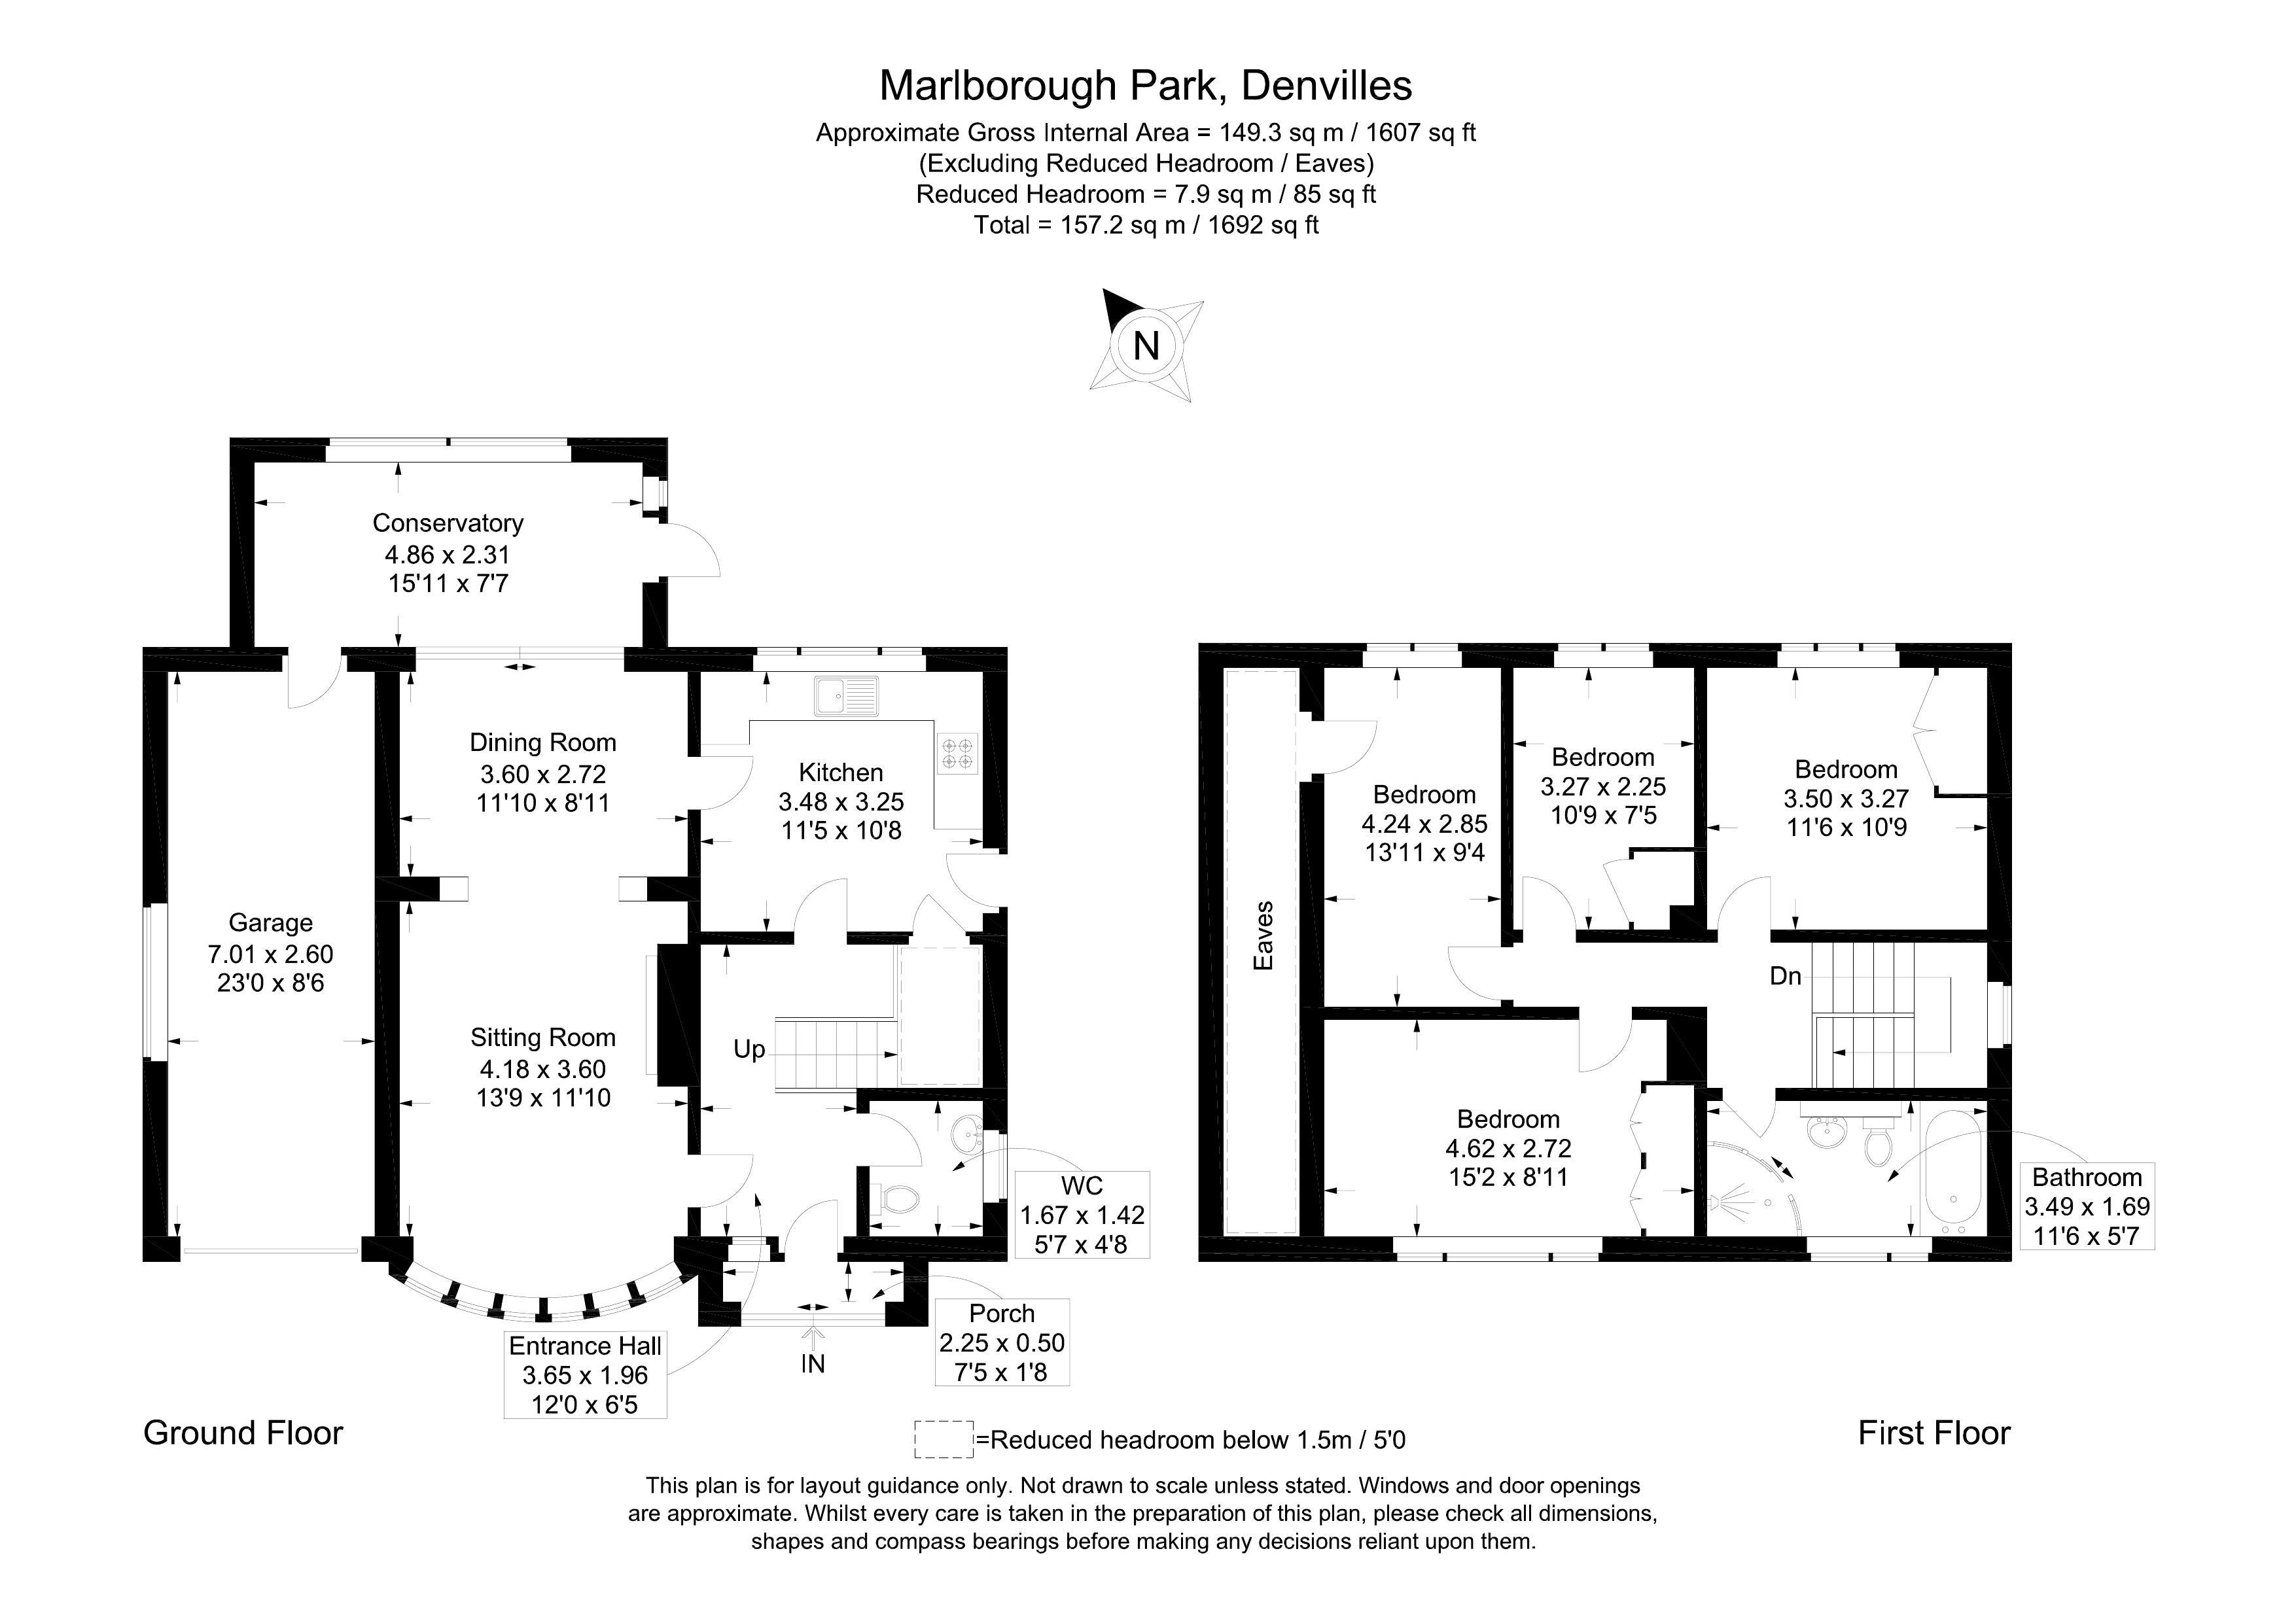 Marlborough Park Denvilles